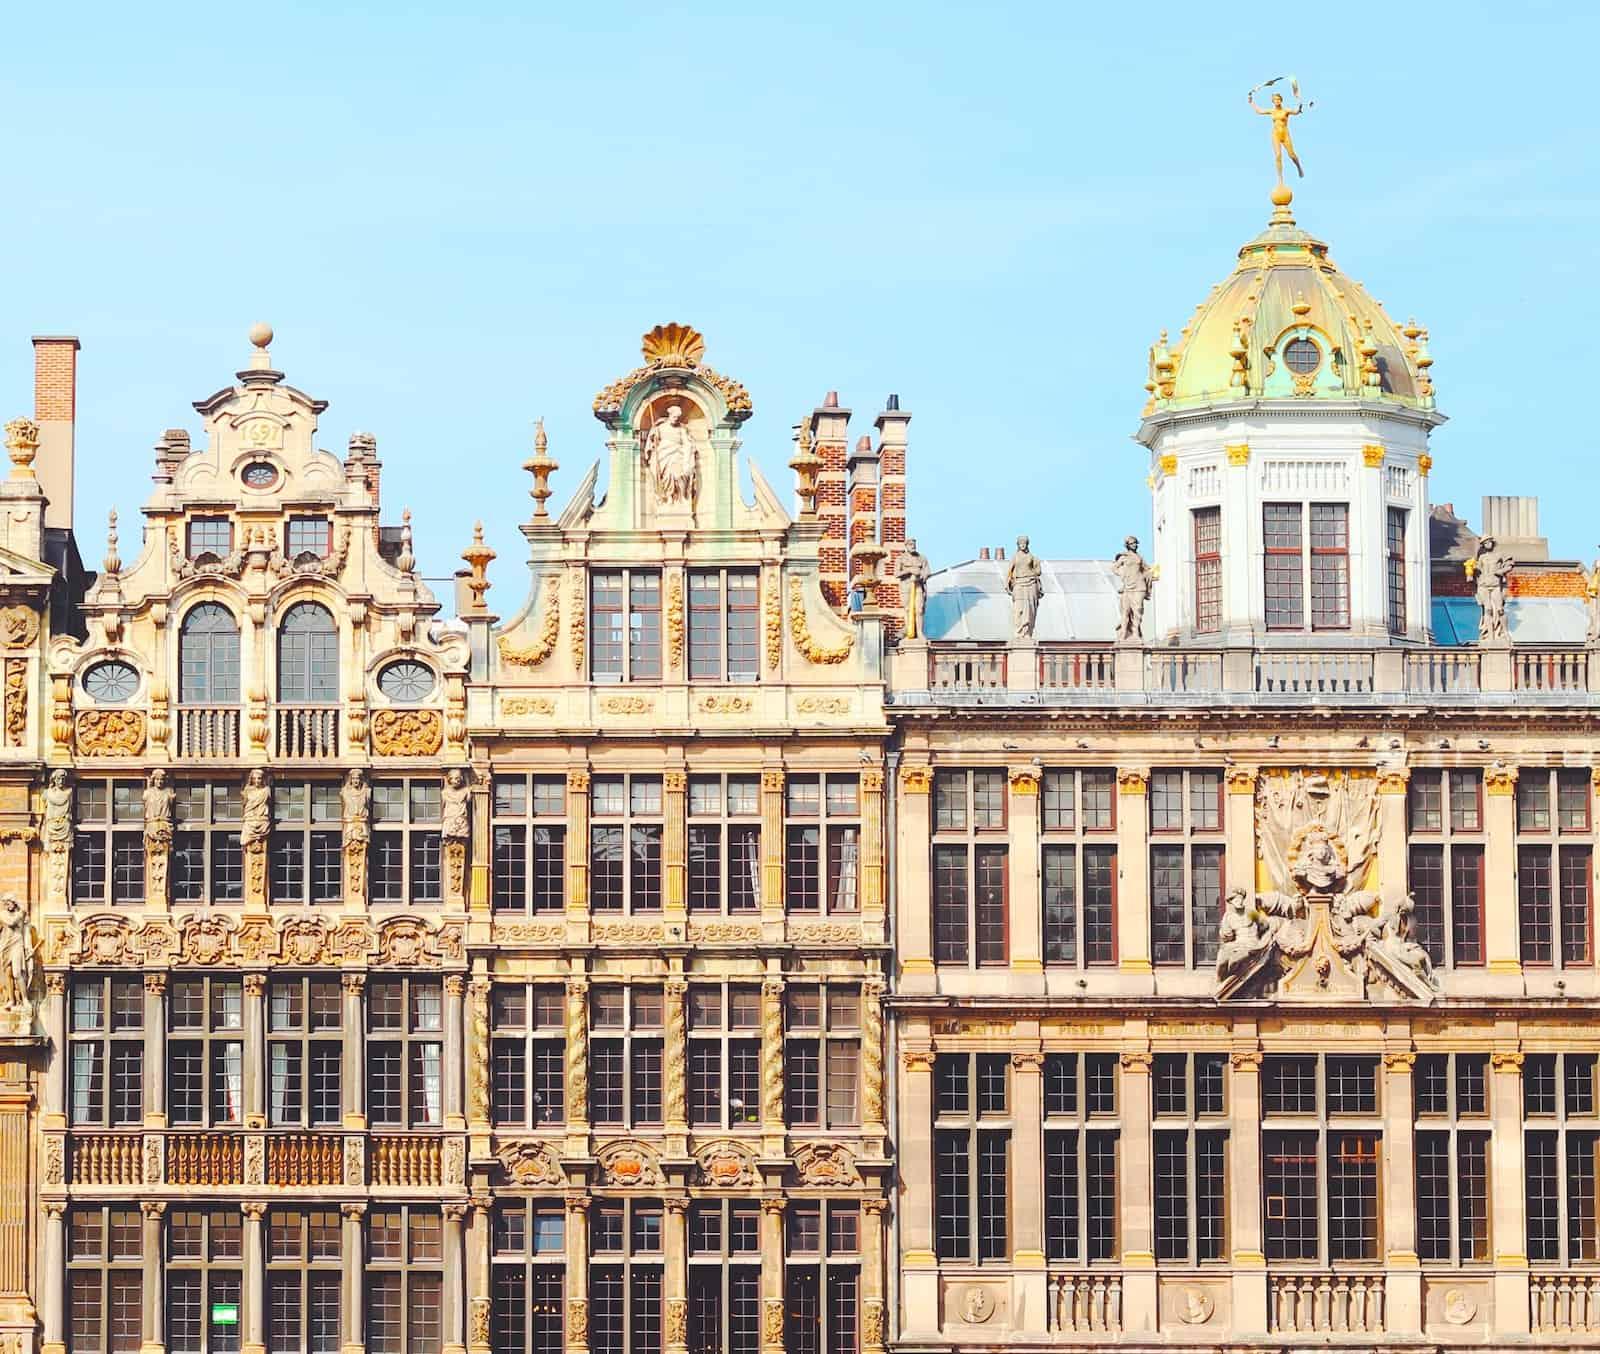 Belgian SME Lender Look & Fin Raises €6 Million to Fuel Growth